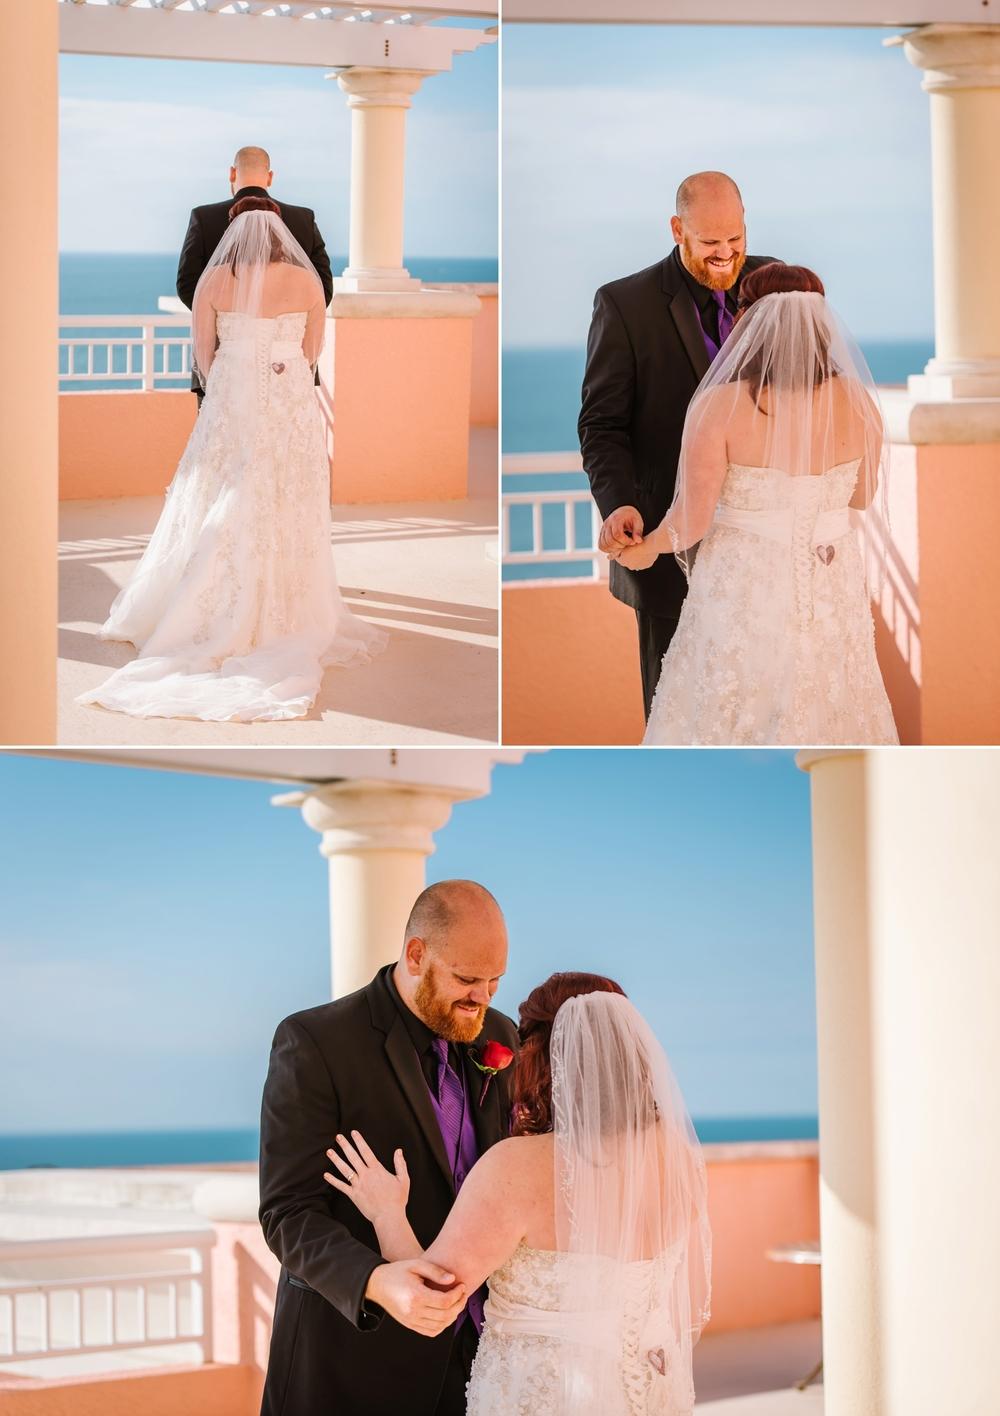 clearwater-beach-hyatt-masquerade-ballroom-themed-wedding-photograpy_0009.jpg